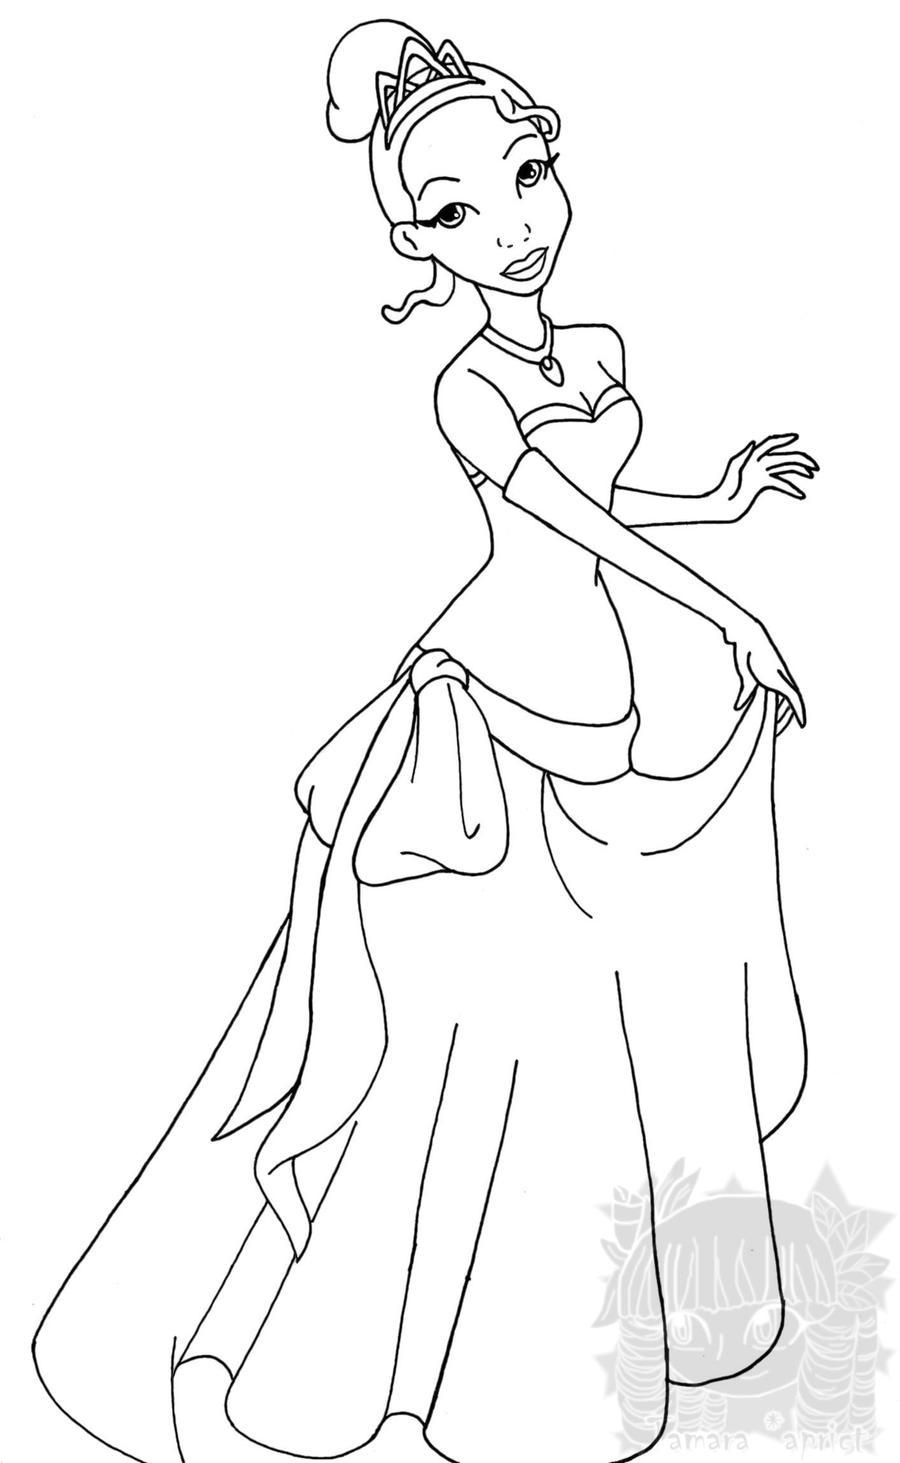 Princess Tiana Disney Coloring Pages. PRINCESAS DISNEY PARA COLOREAR ...